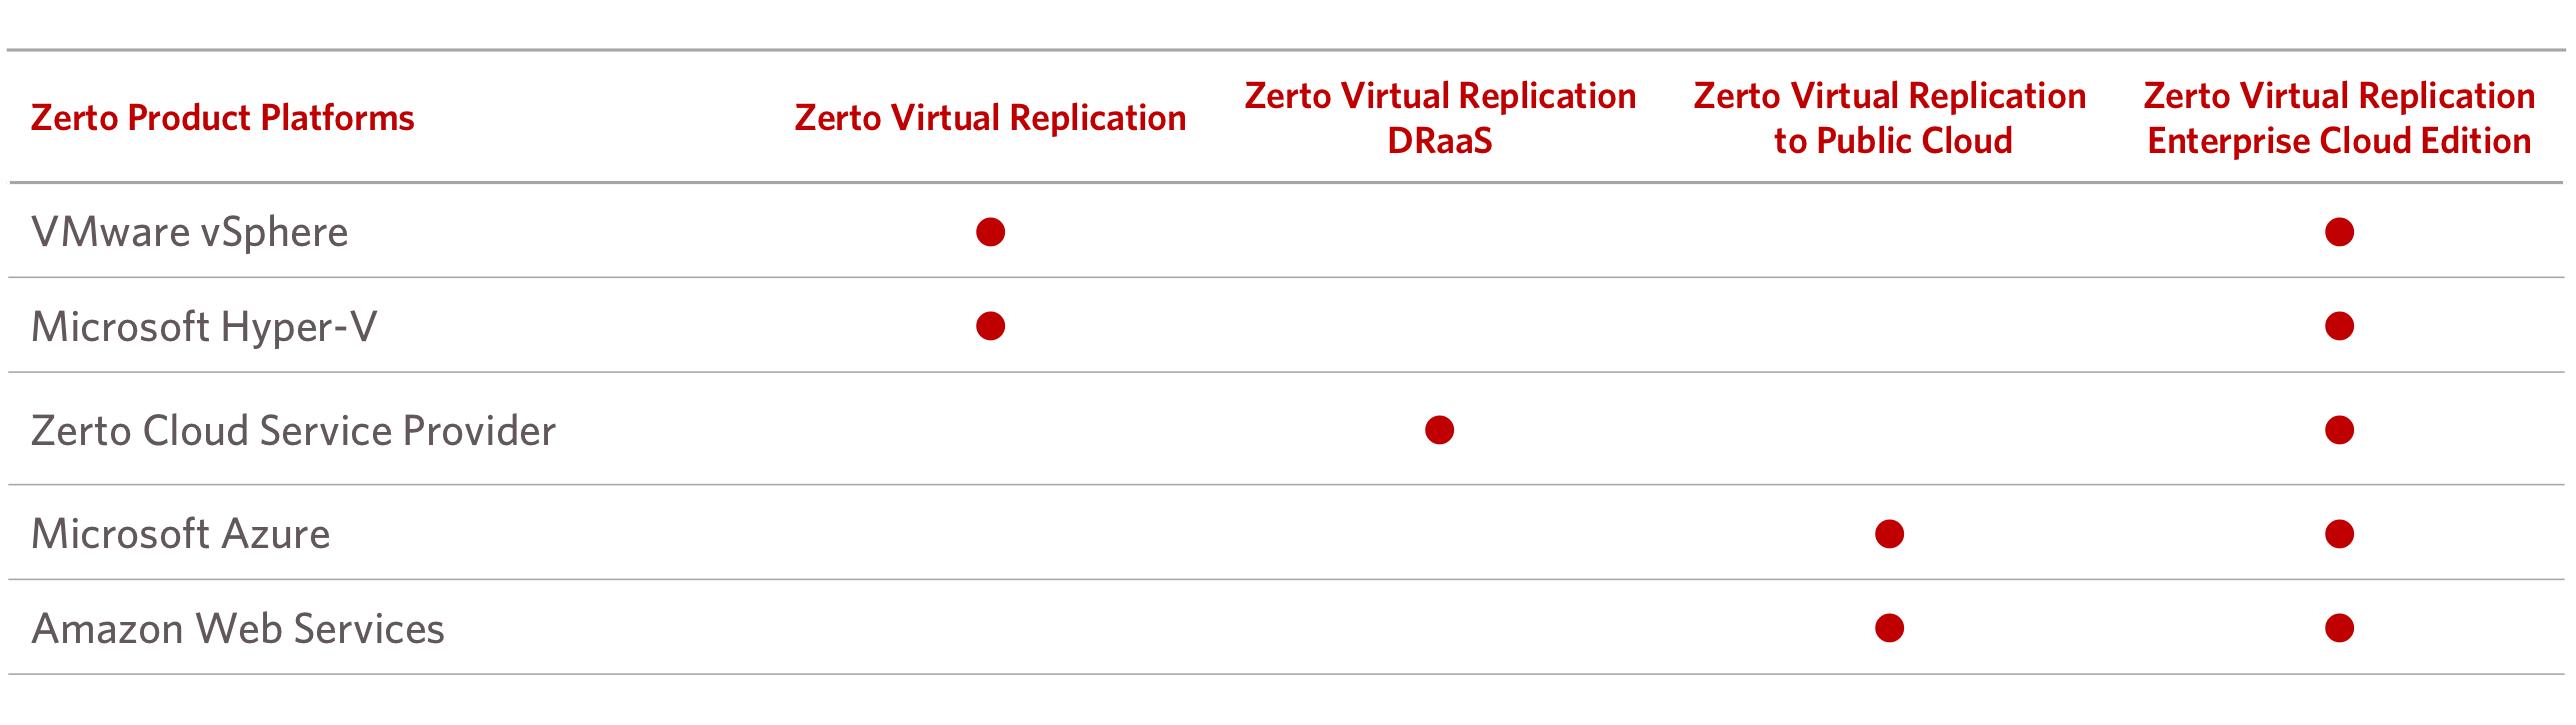 zvr_replicationlicensematrix